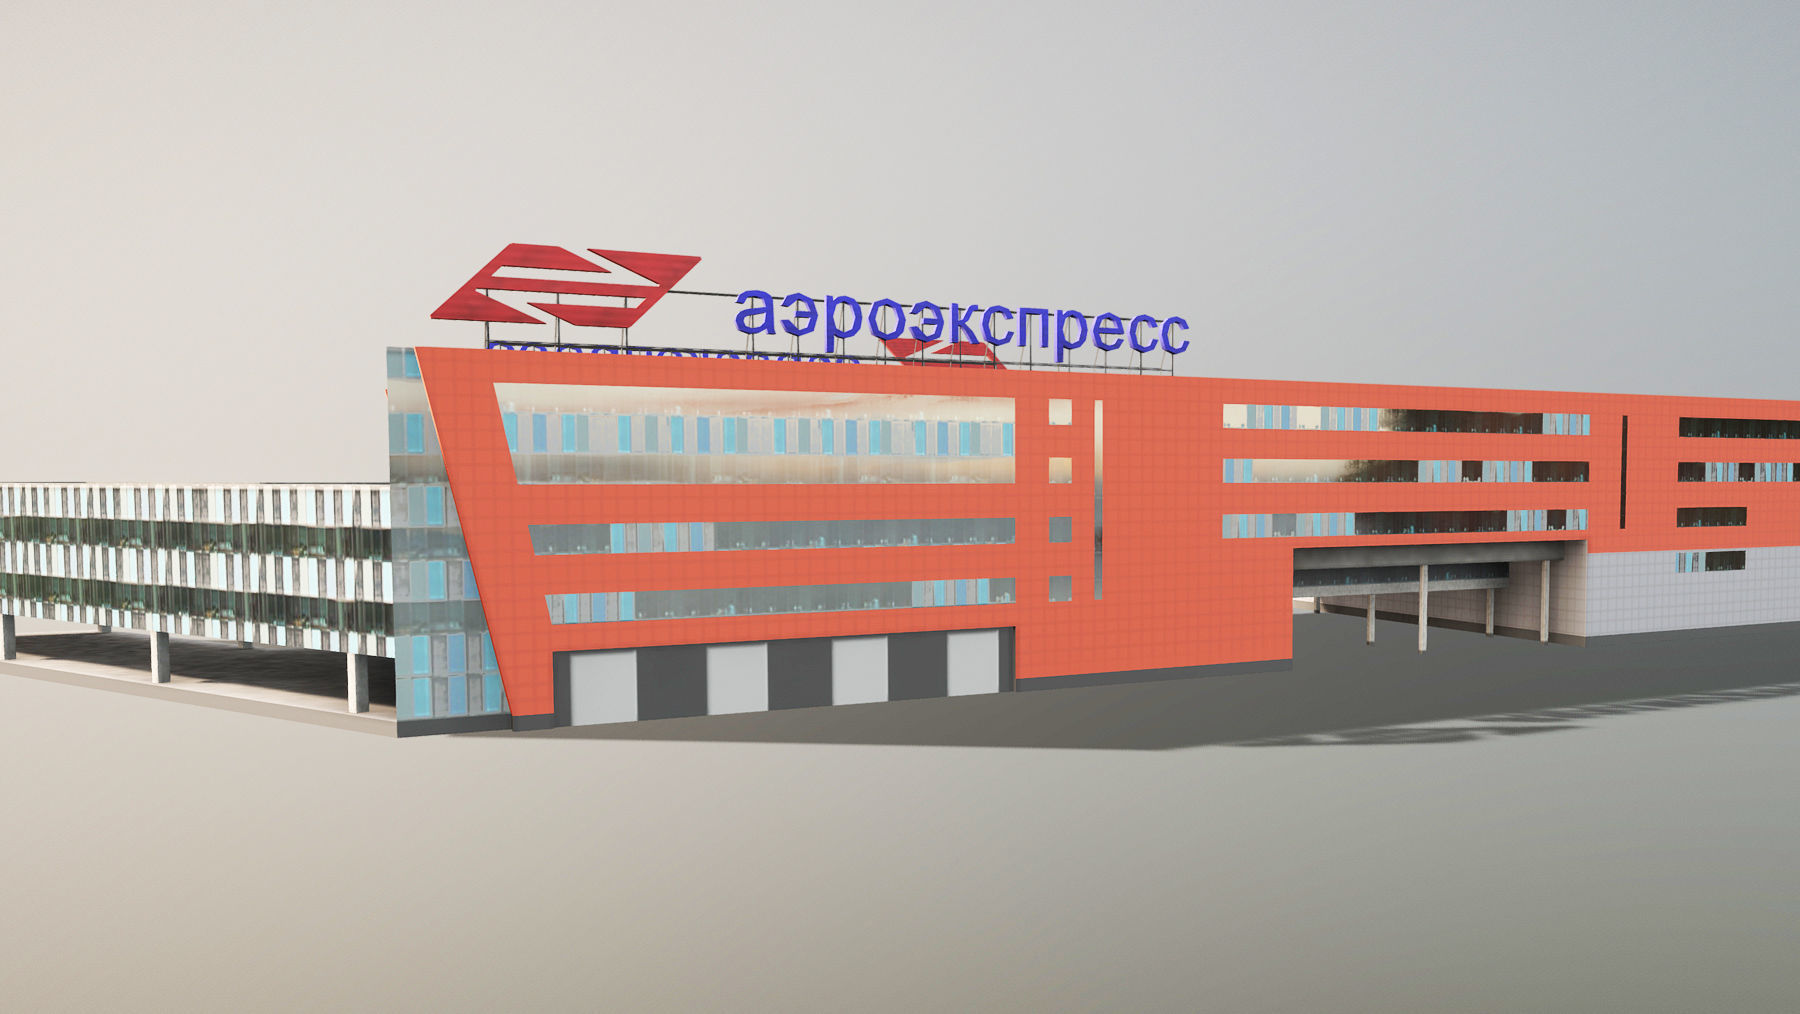 Airport Railroad Station UUEE Aeroexpress